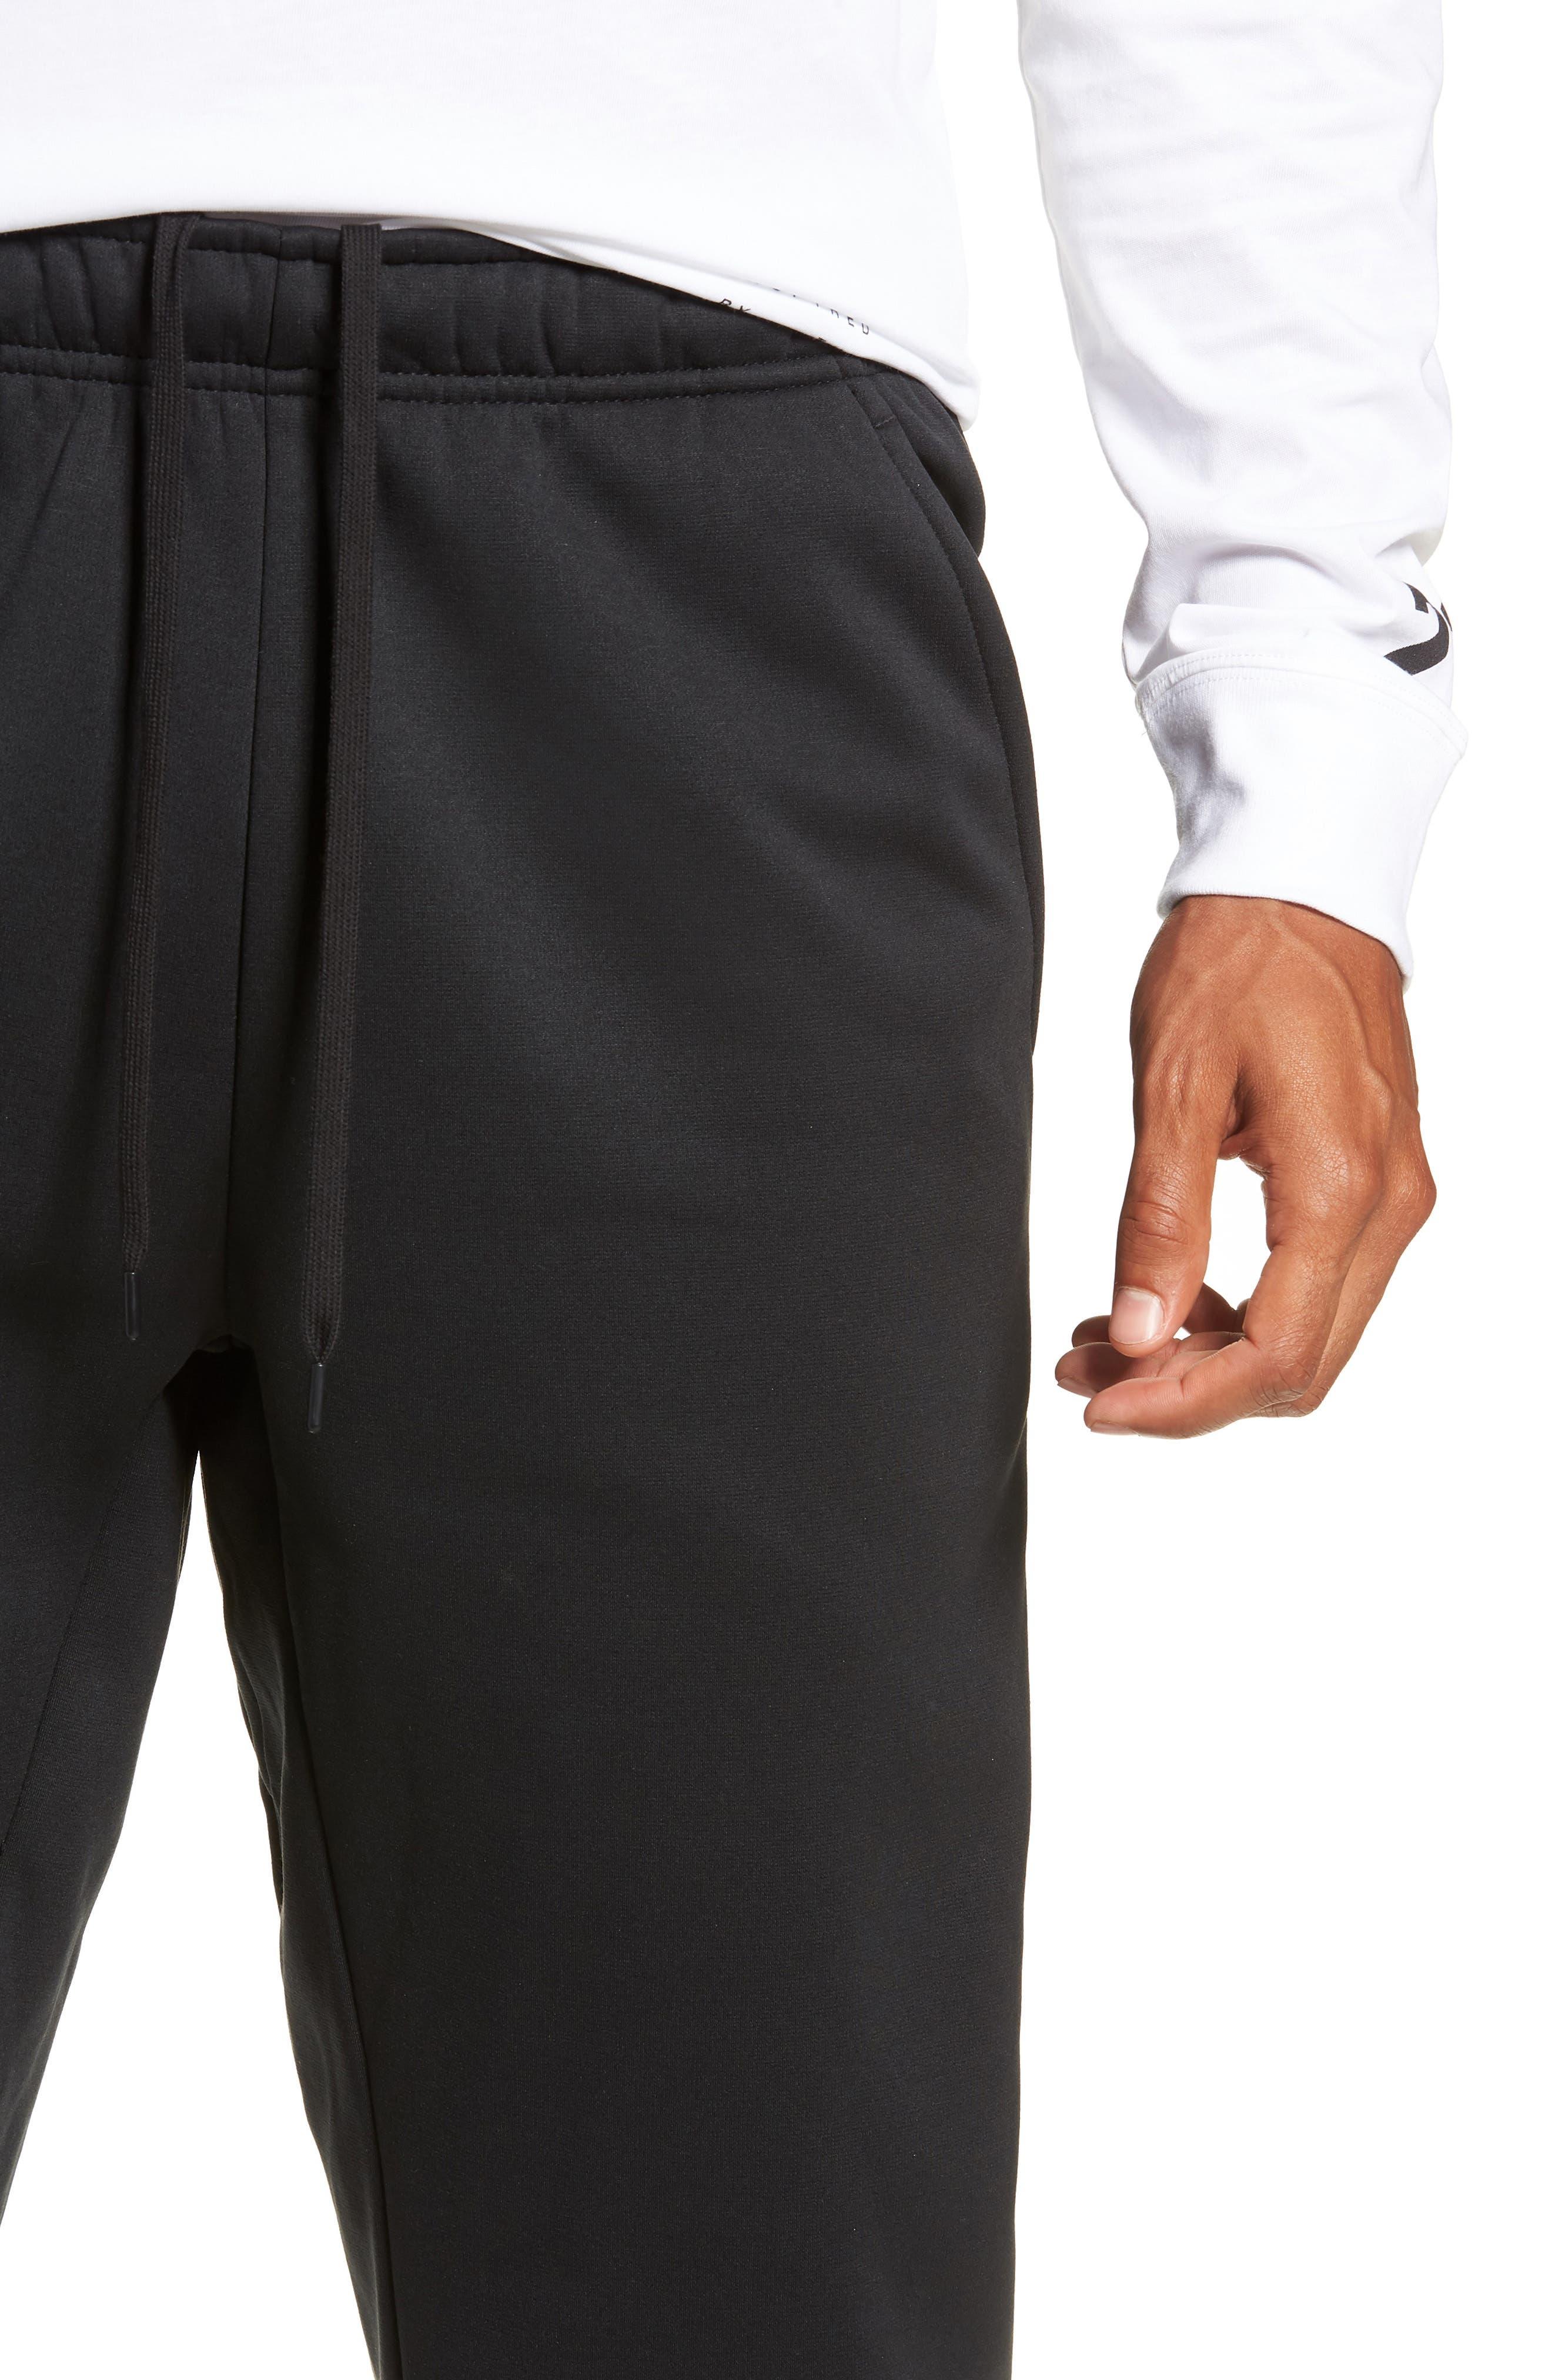 Therma Tapered Pants,                             Alternate thumbnail 4, color,                             BLACK/ WHITE